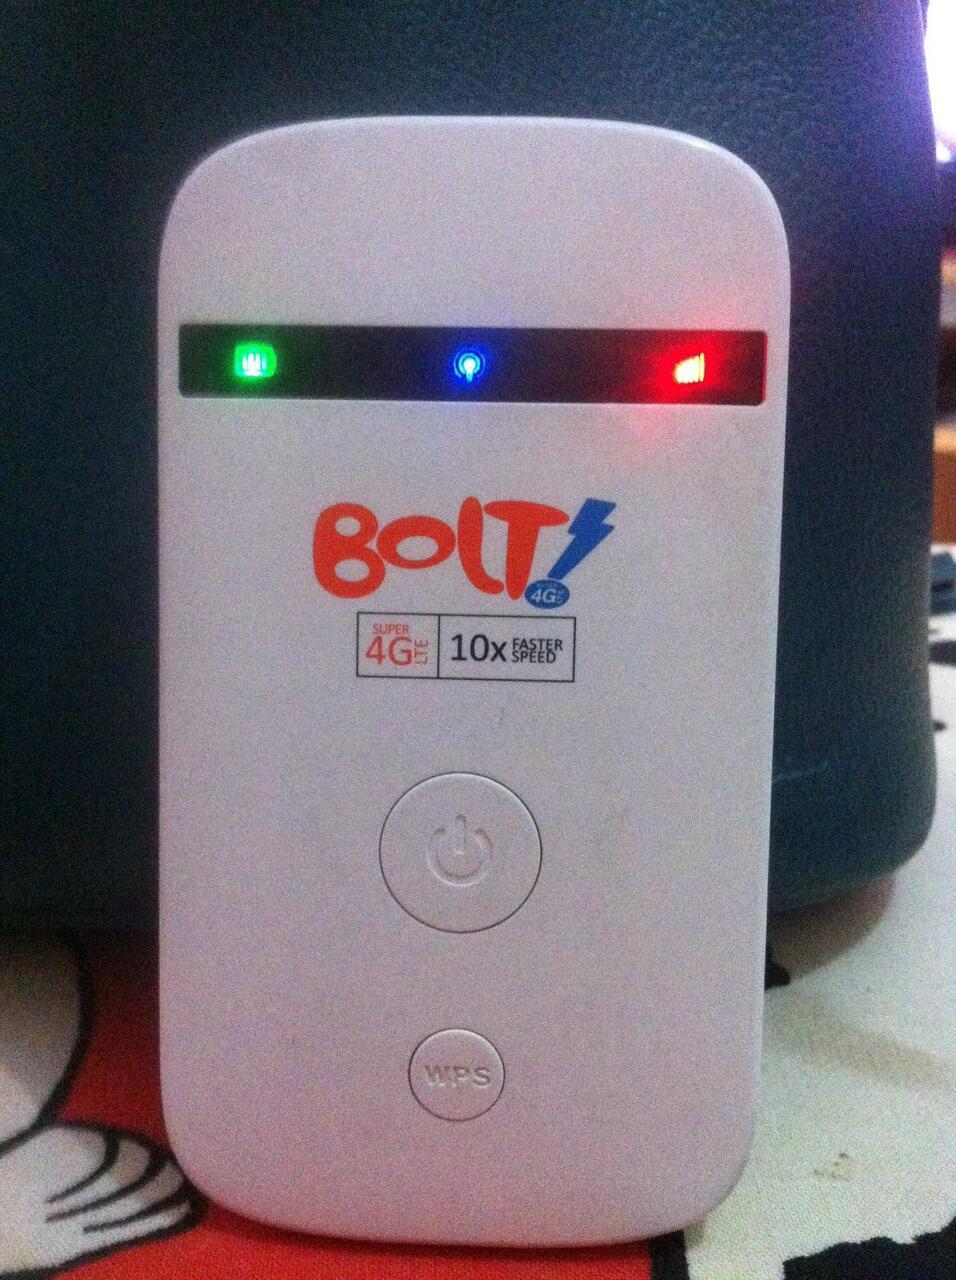 Review Dan Diskusi Modem Zte Mf90 Bolt Multi Mode Tdd Fdd Mifi Unlock Gsm 3g Router 100